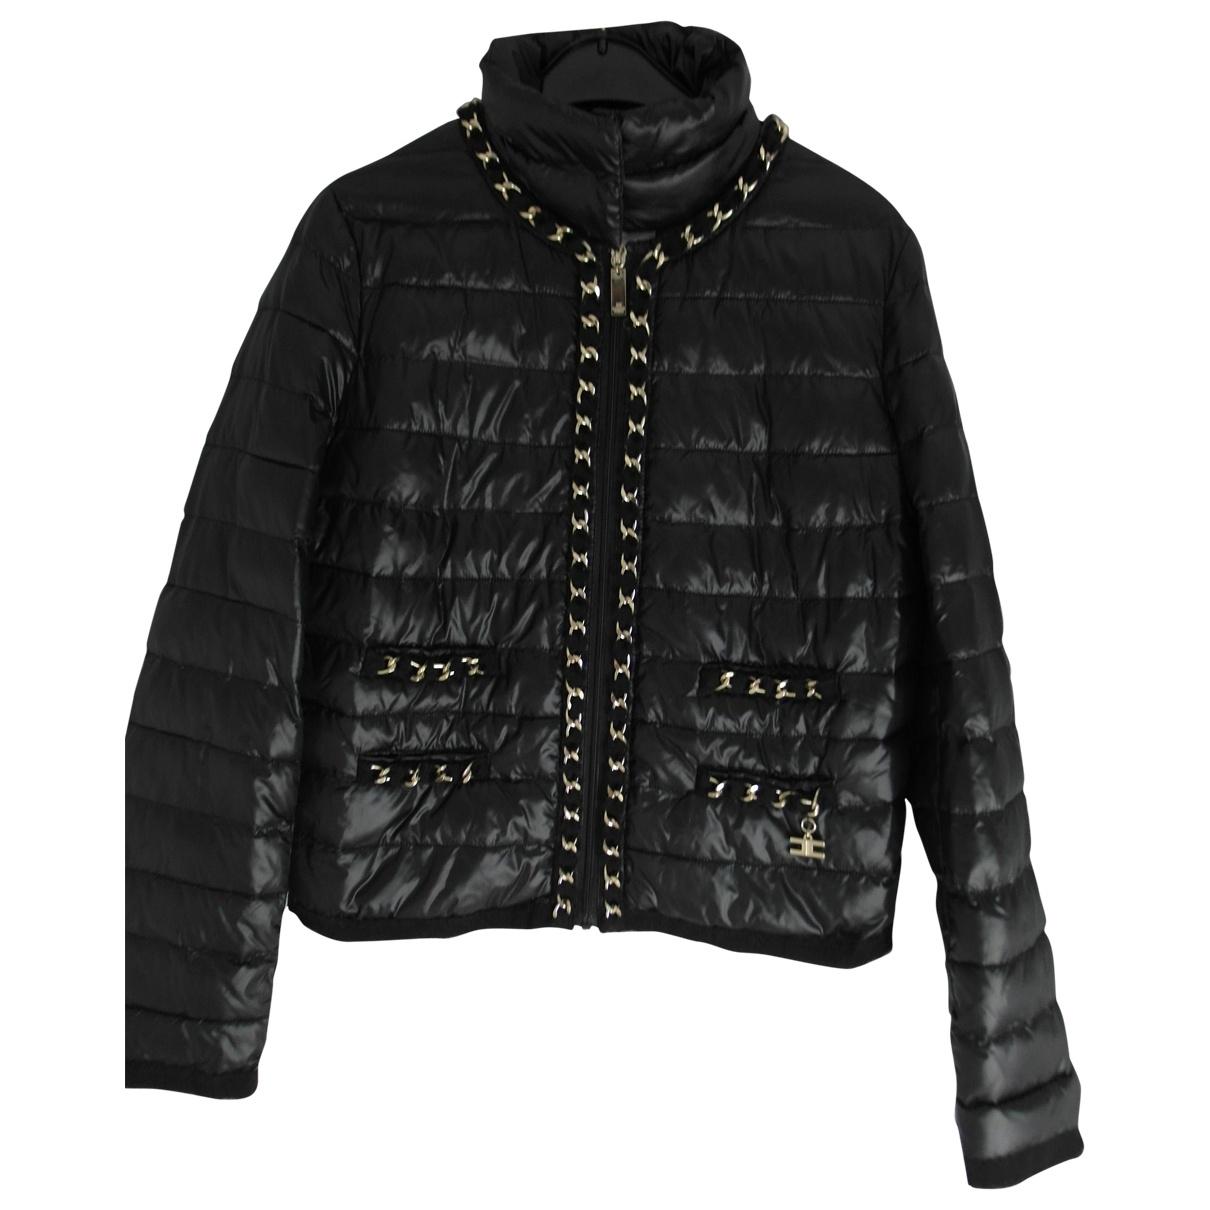 Elisabetta Franchi \N Black jacket for Women 44 IT